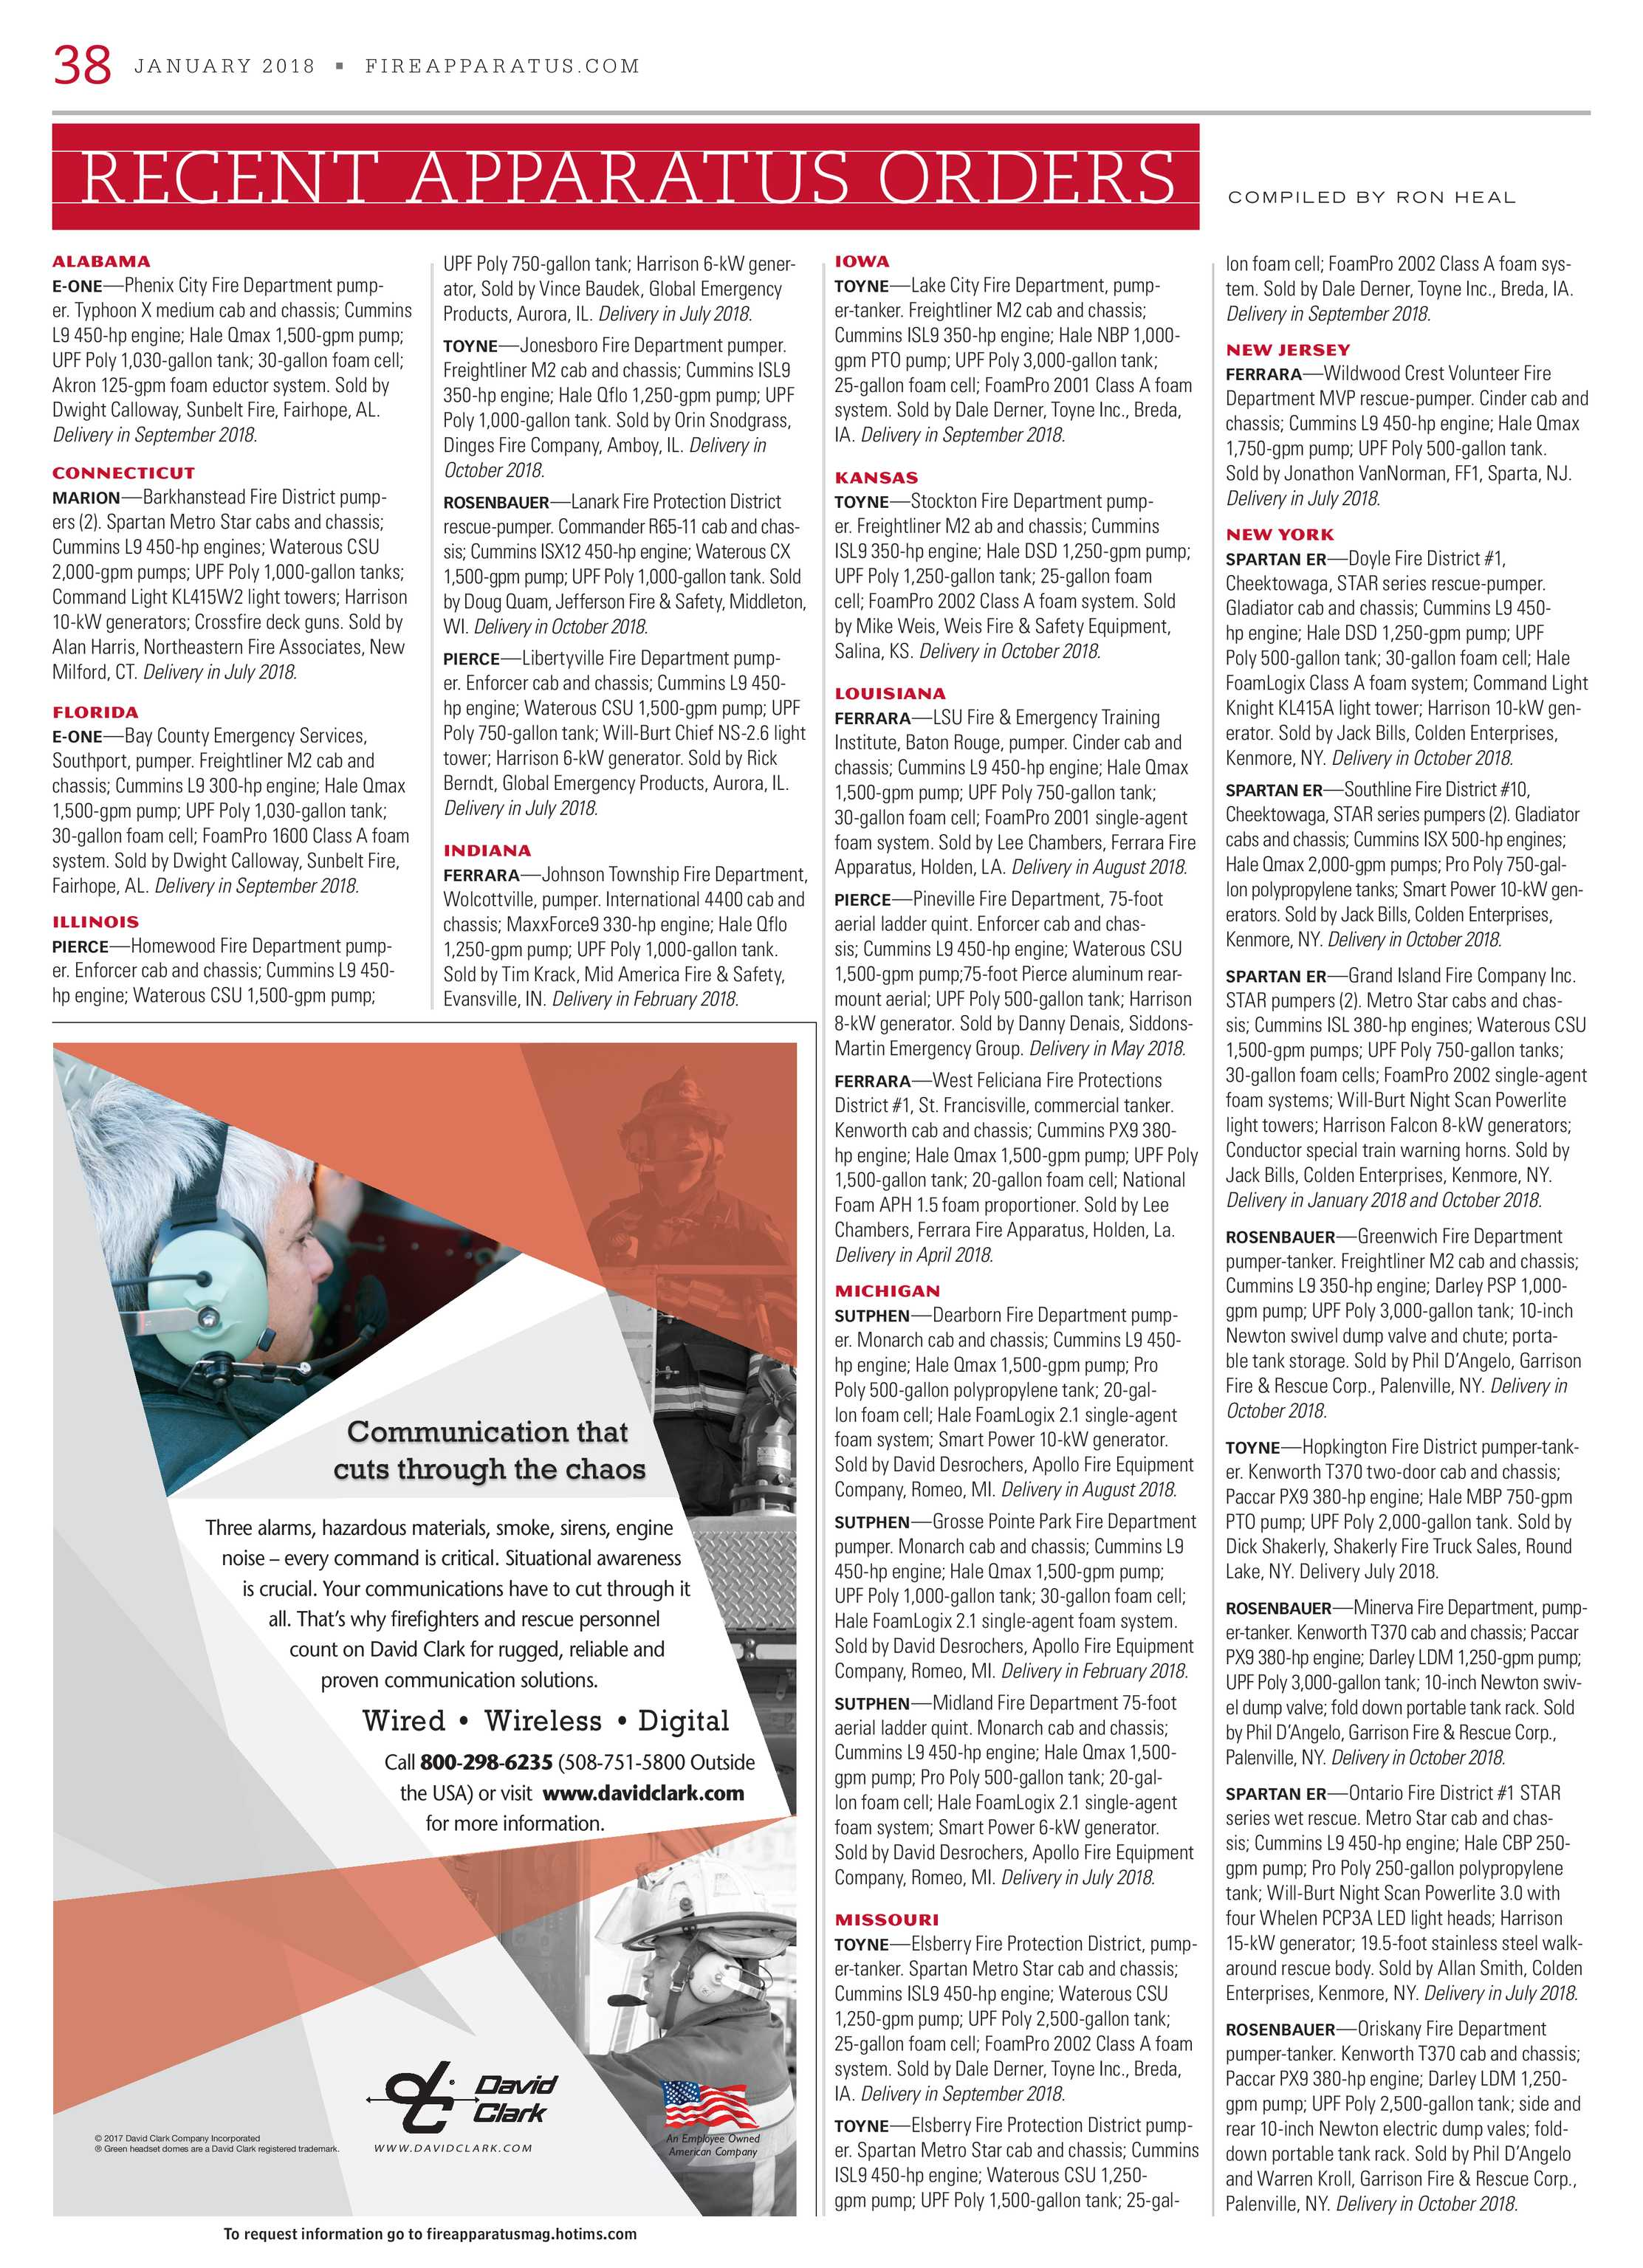 Fire Apparatus Magazine - January 2018 - page 38